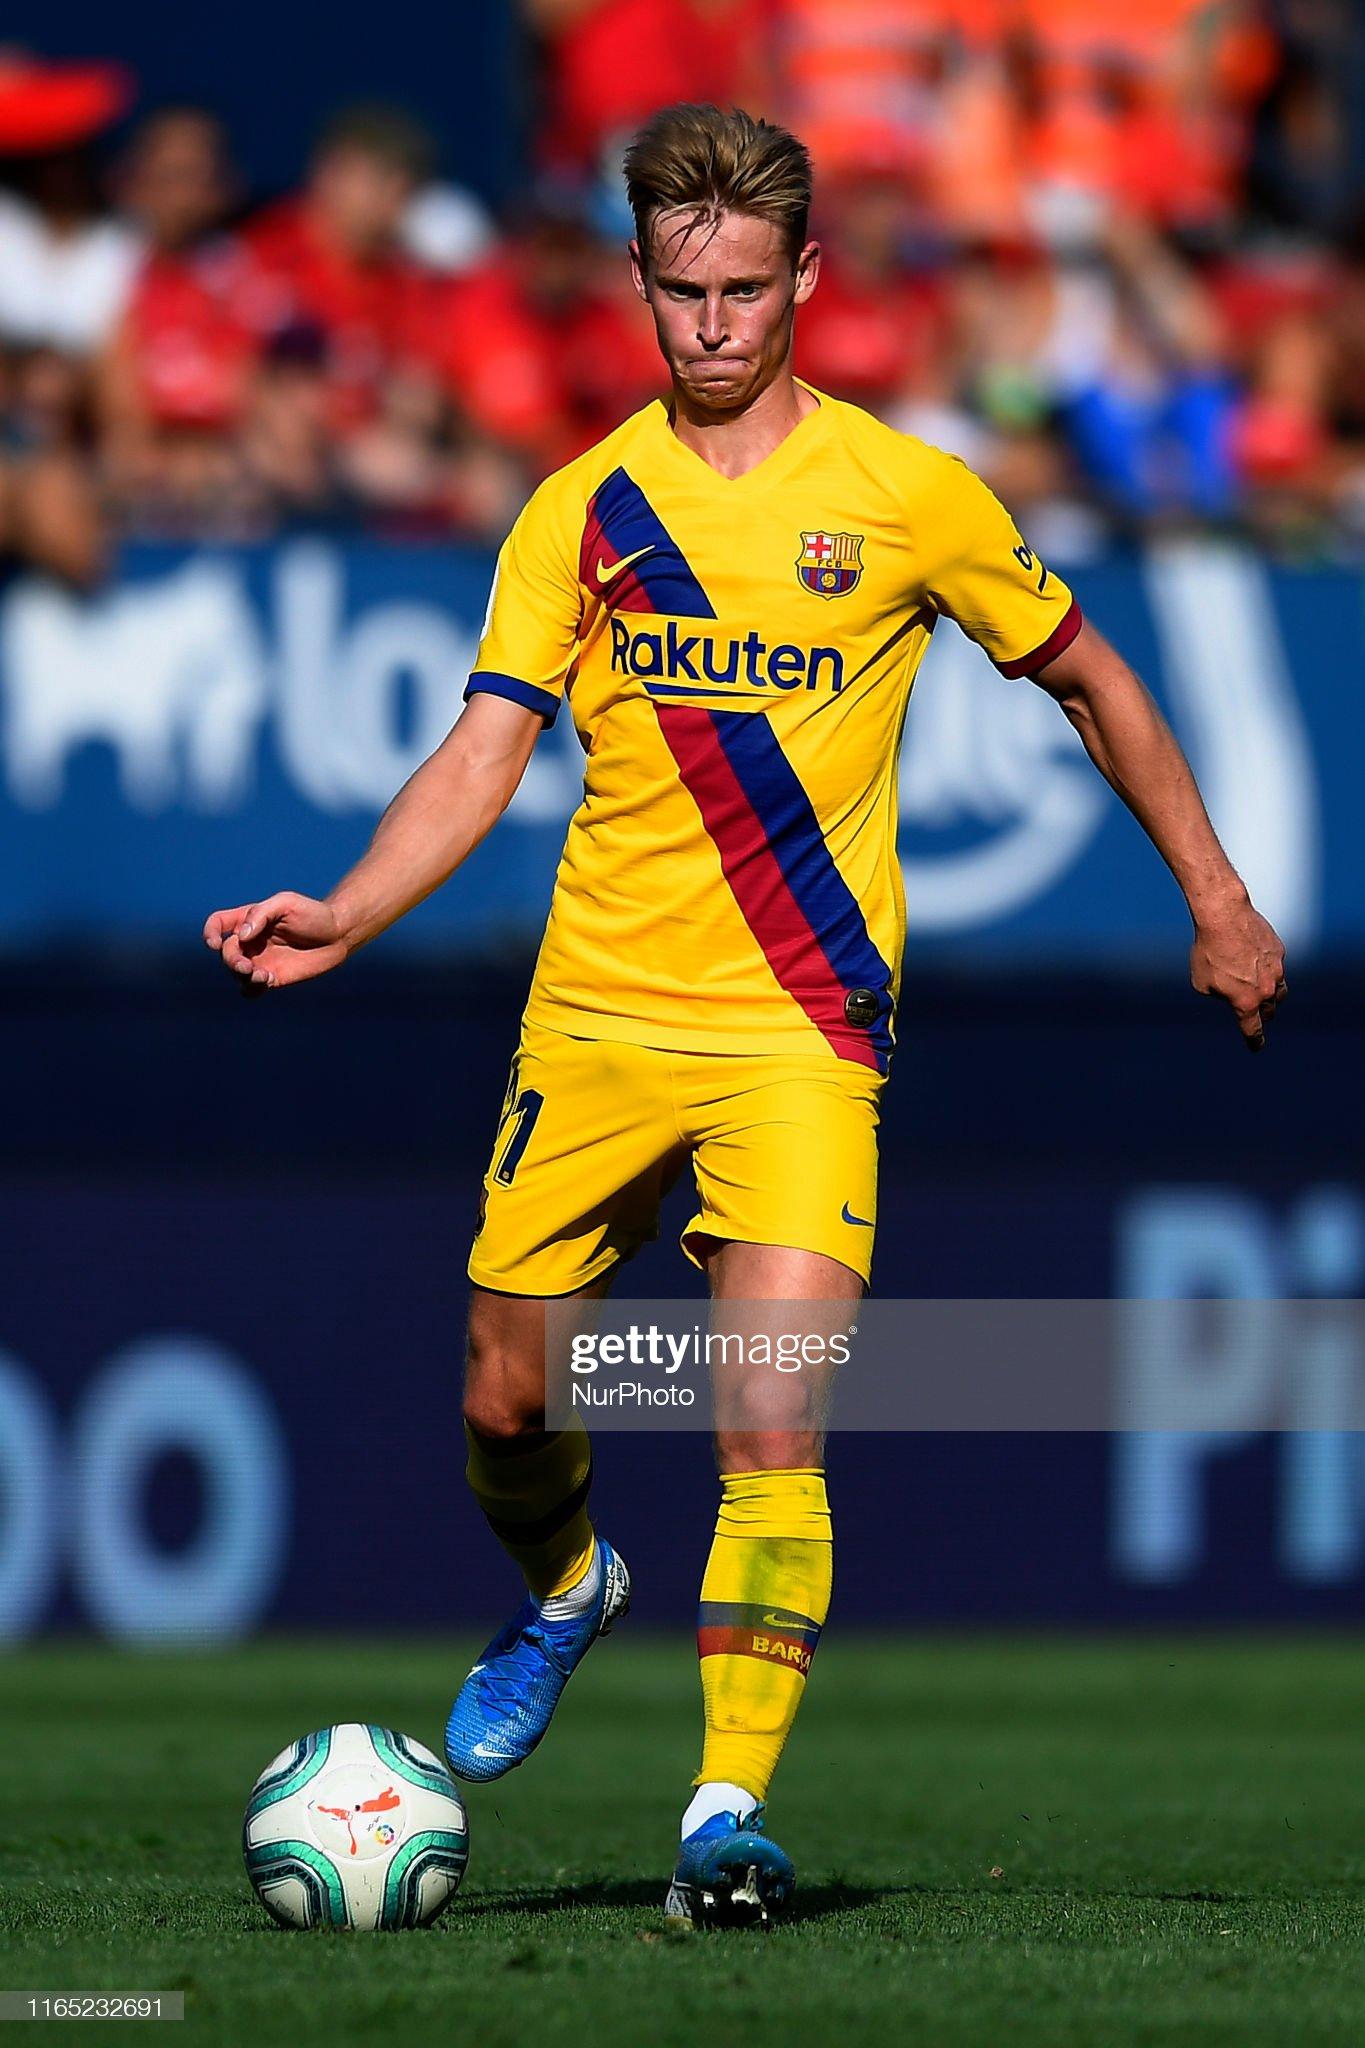 صور مباراة : أوساسونا - برشلونة 2-2 ( 31-08-2019 )  Frenkie-de-jong-of-barcelona-in-action-during-the-liga-match-between-picture-id1165232691?s=2048x2048